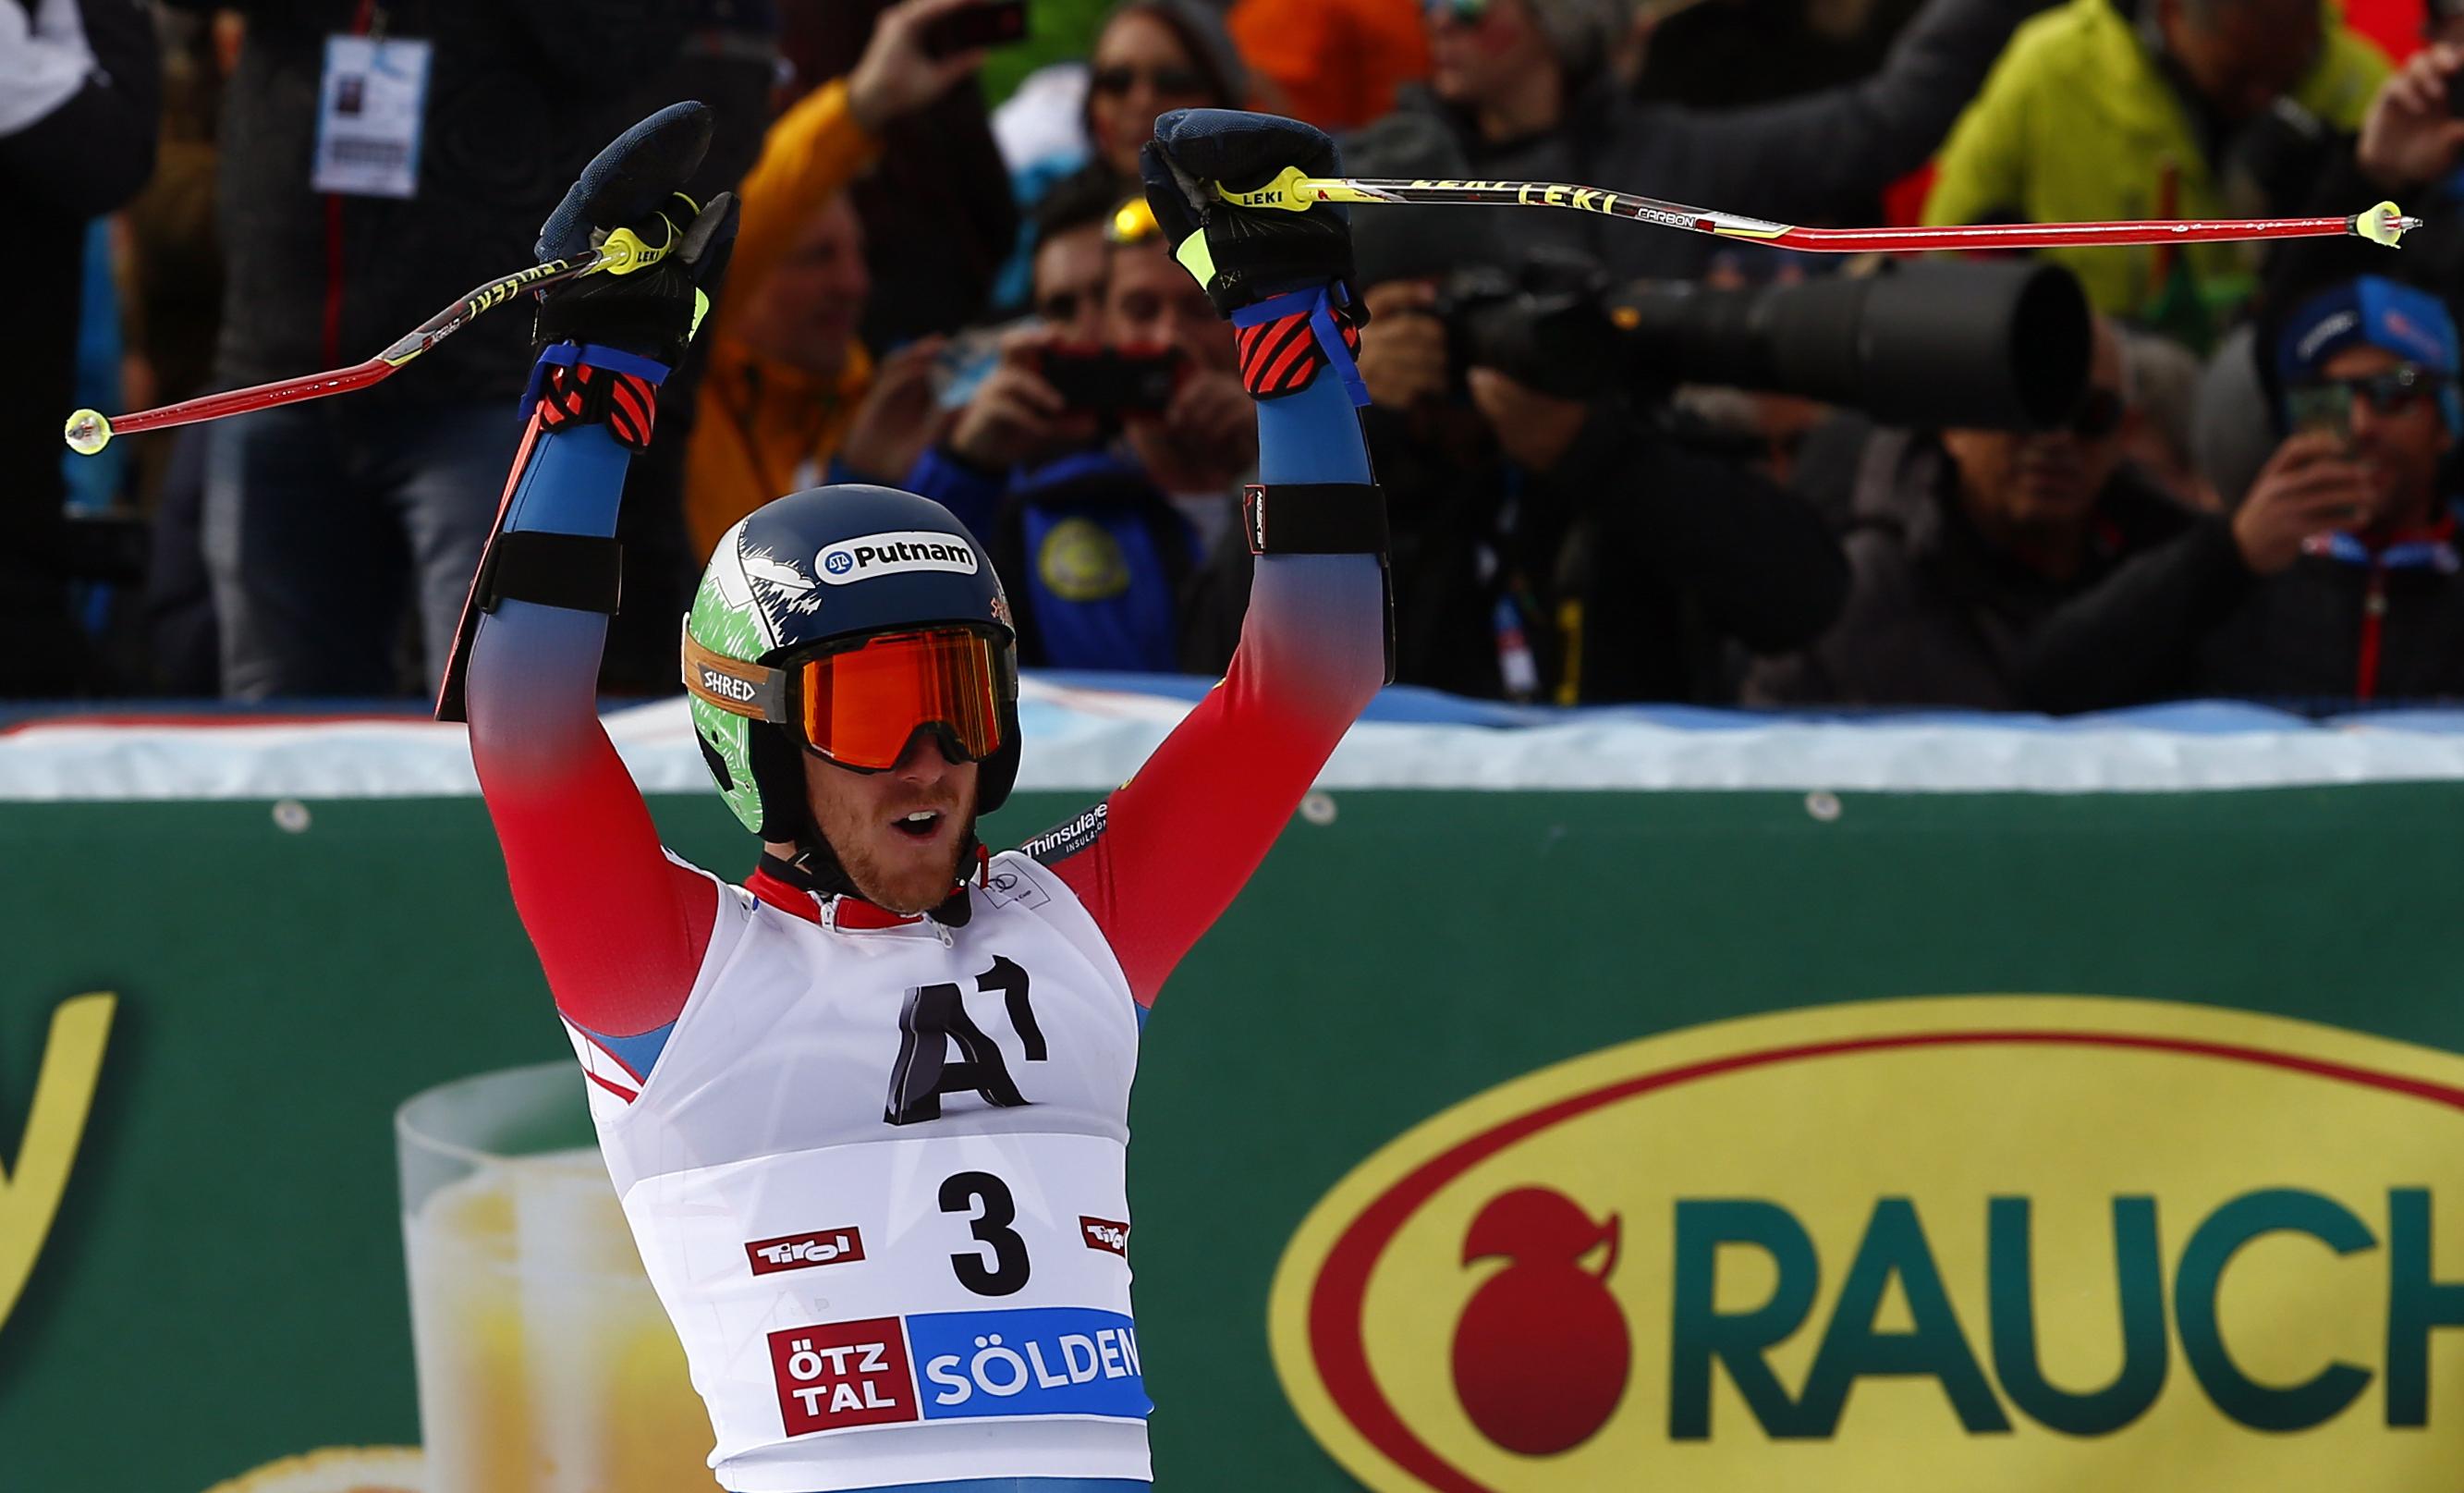 austria_alpine_skiing_world_cup025586296_r7784.jpg